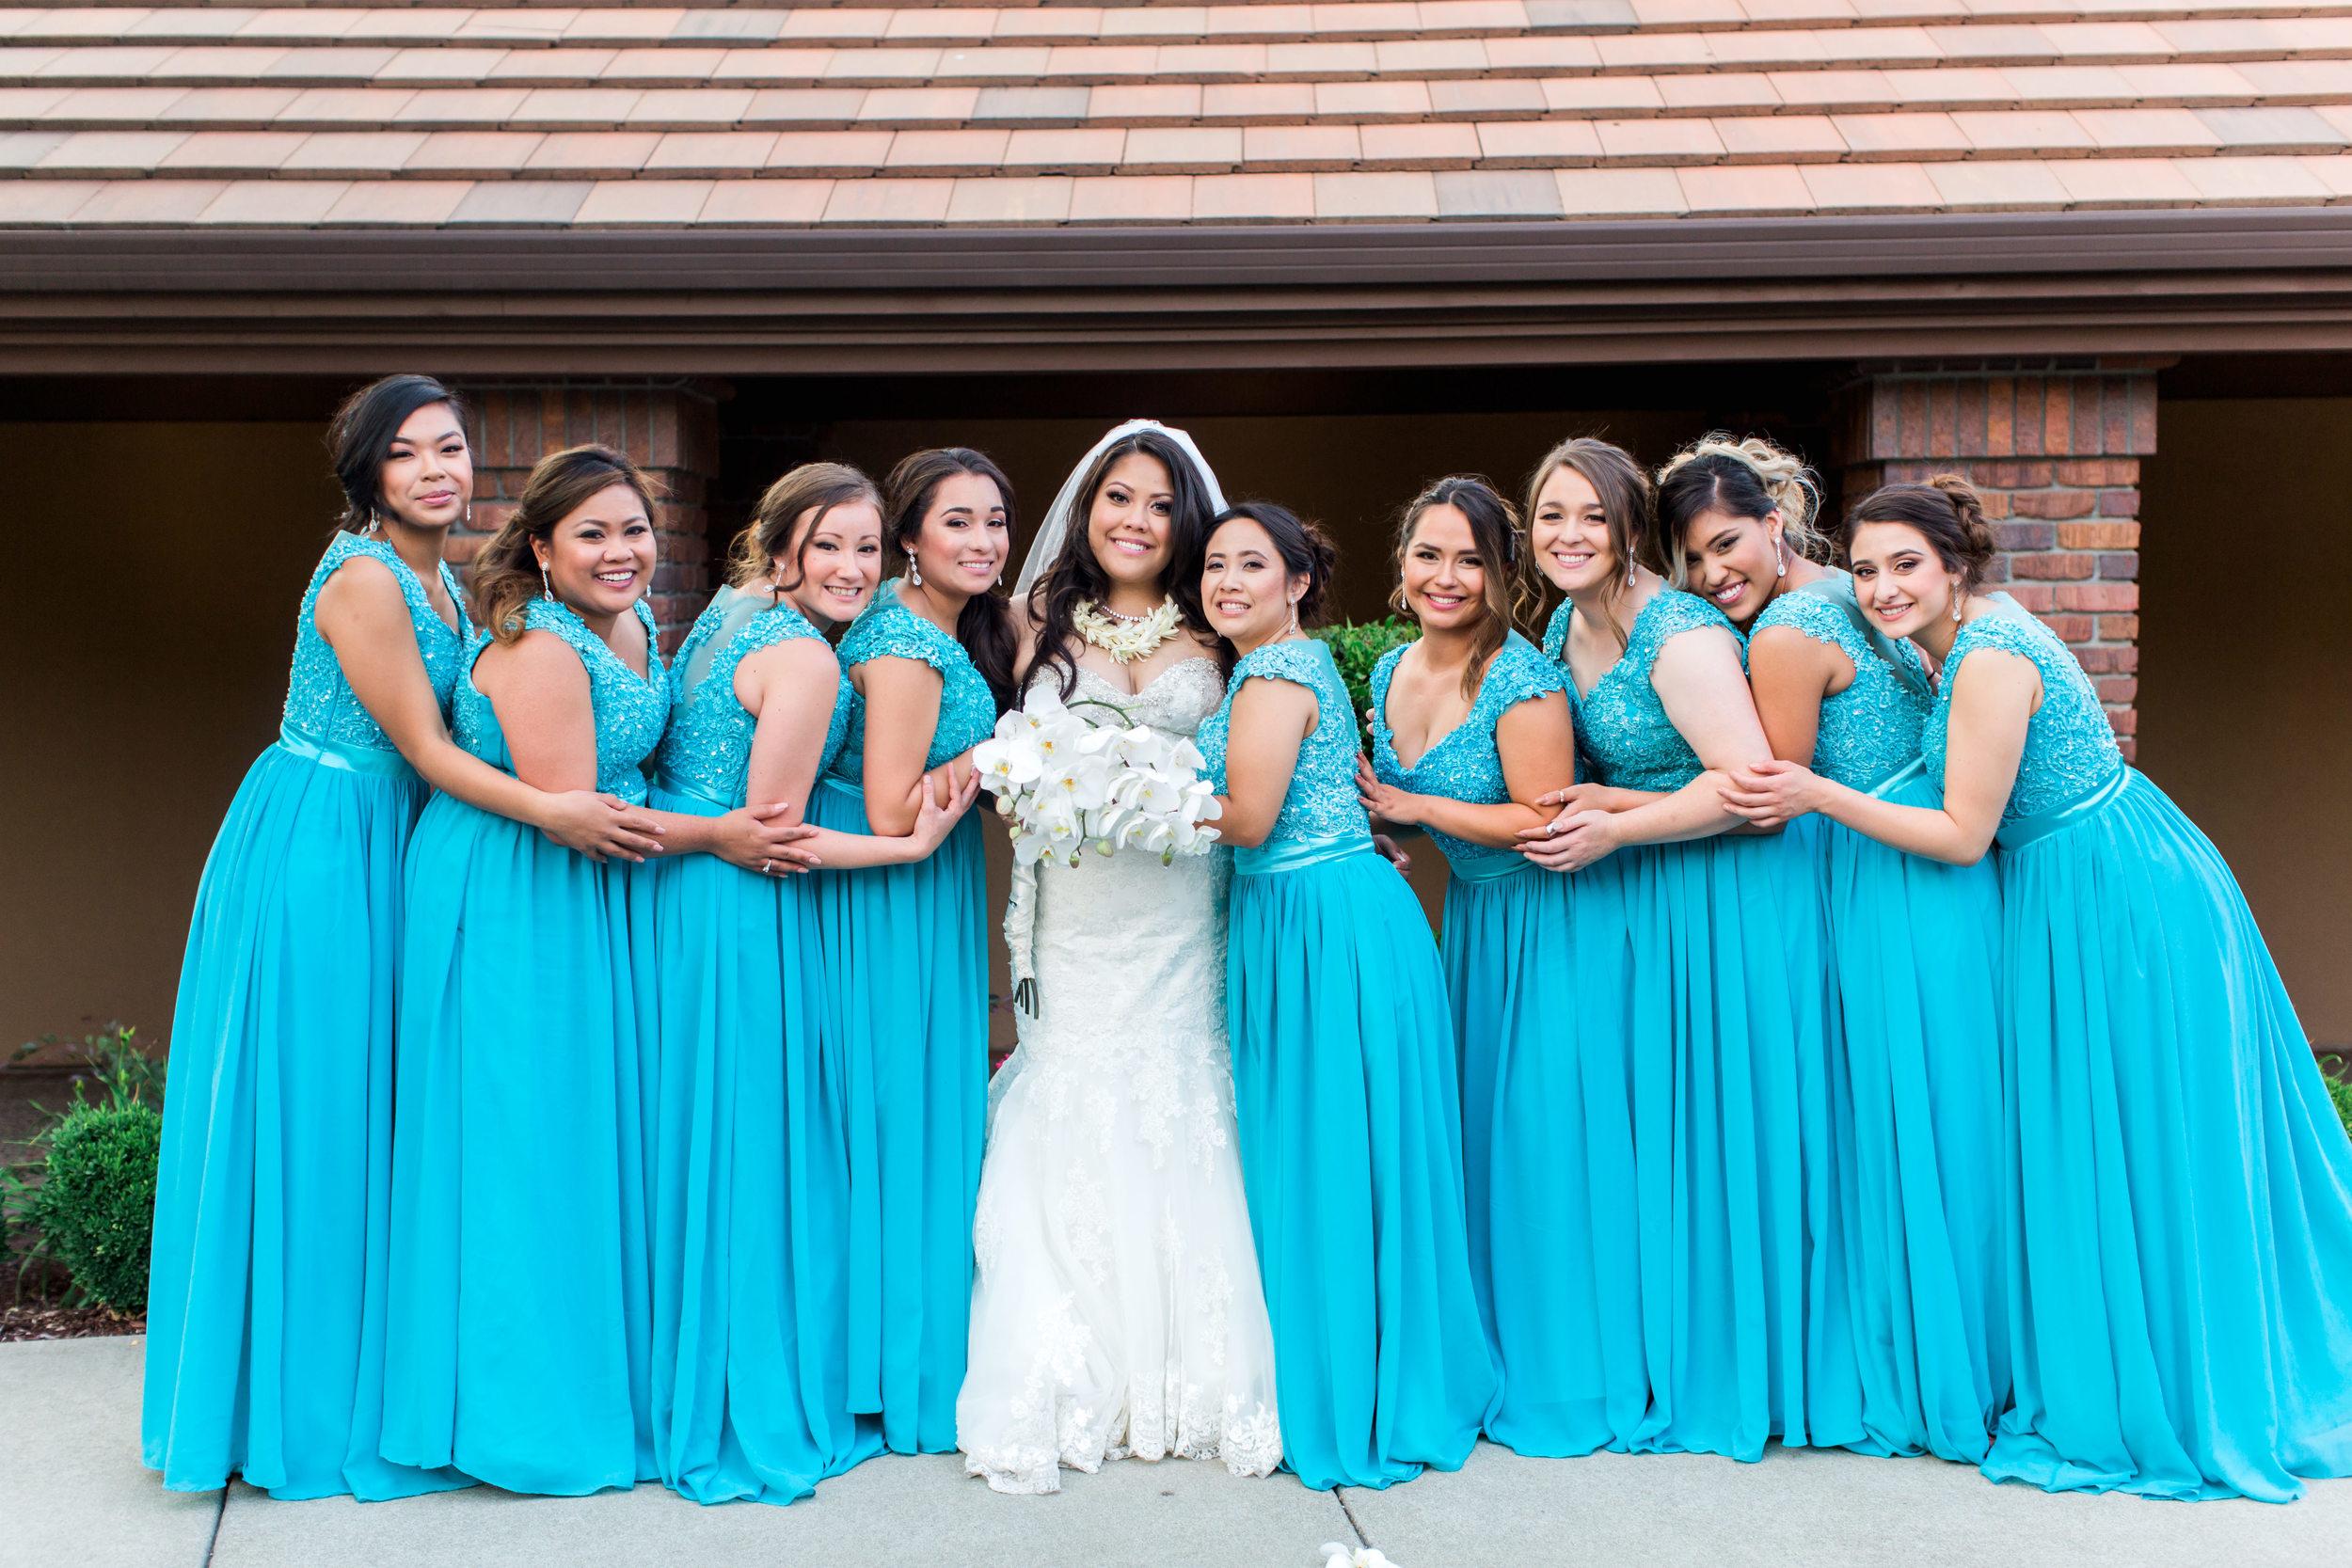 hawaiian-inspired-wedding-at-blackhawk-country-club-3243.jpg